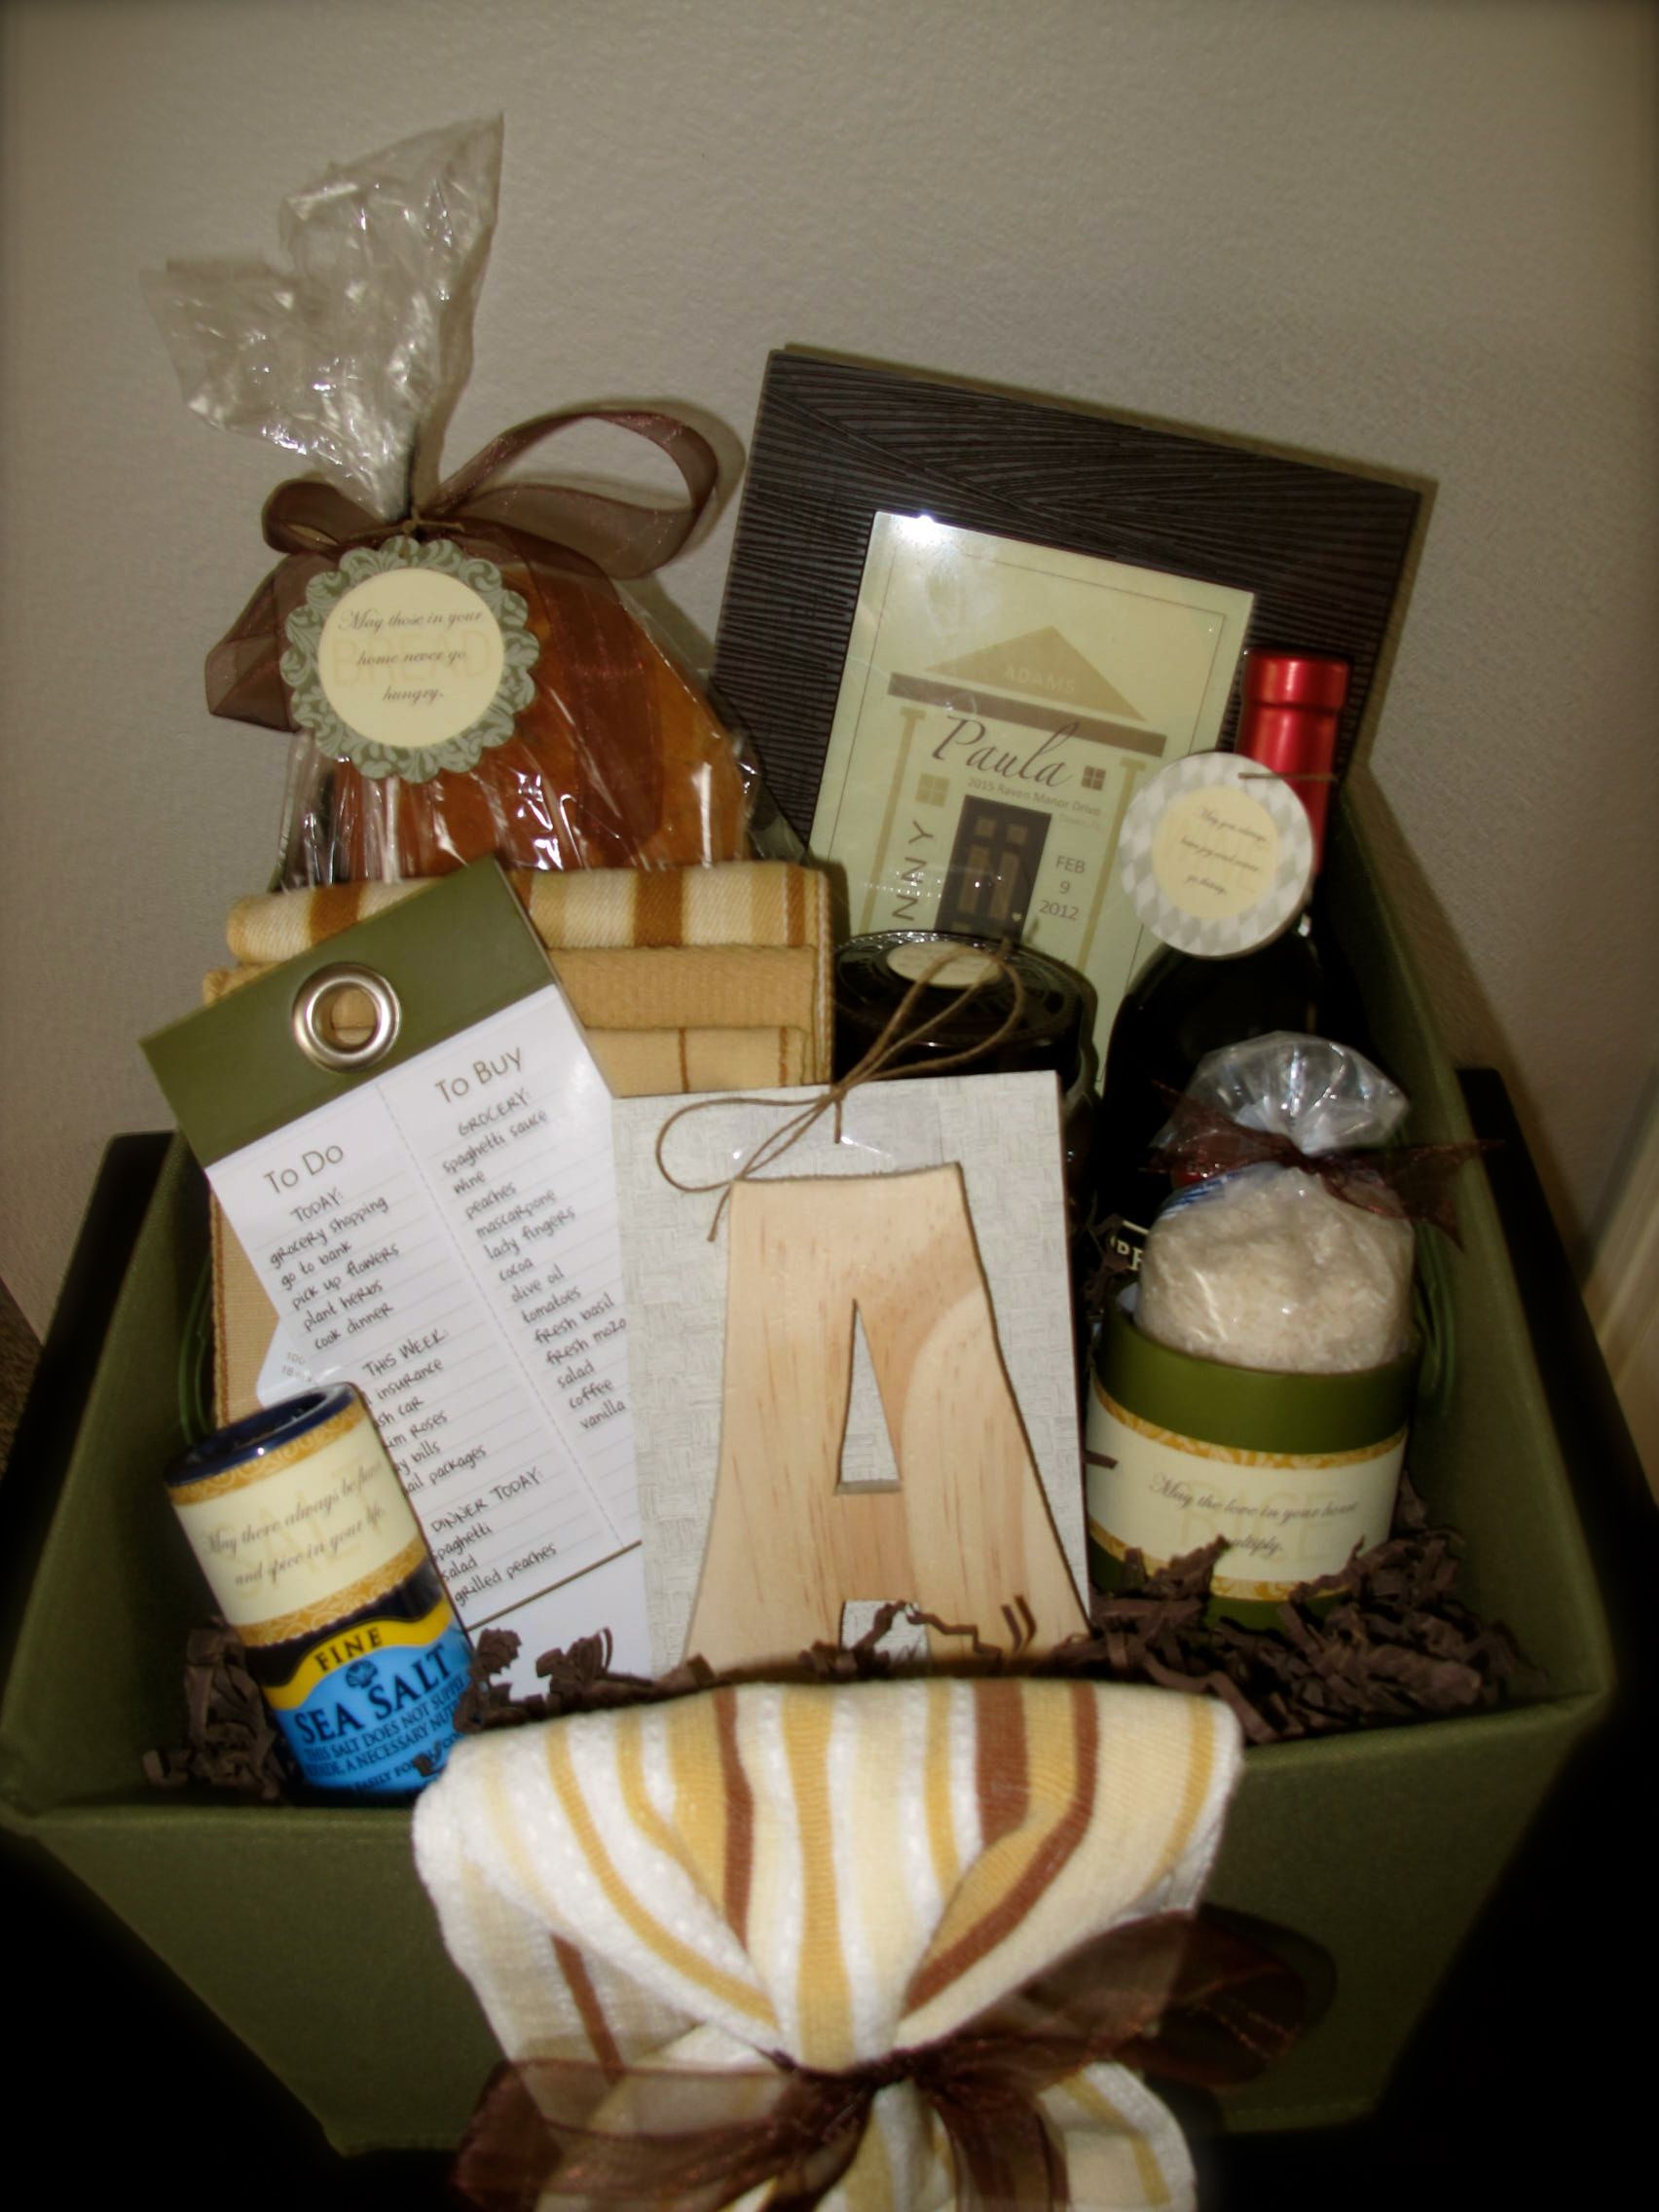 House warming basket easy diy ts simple creative handmade also best images ideas rh pinterest